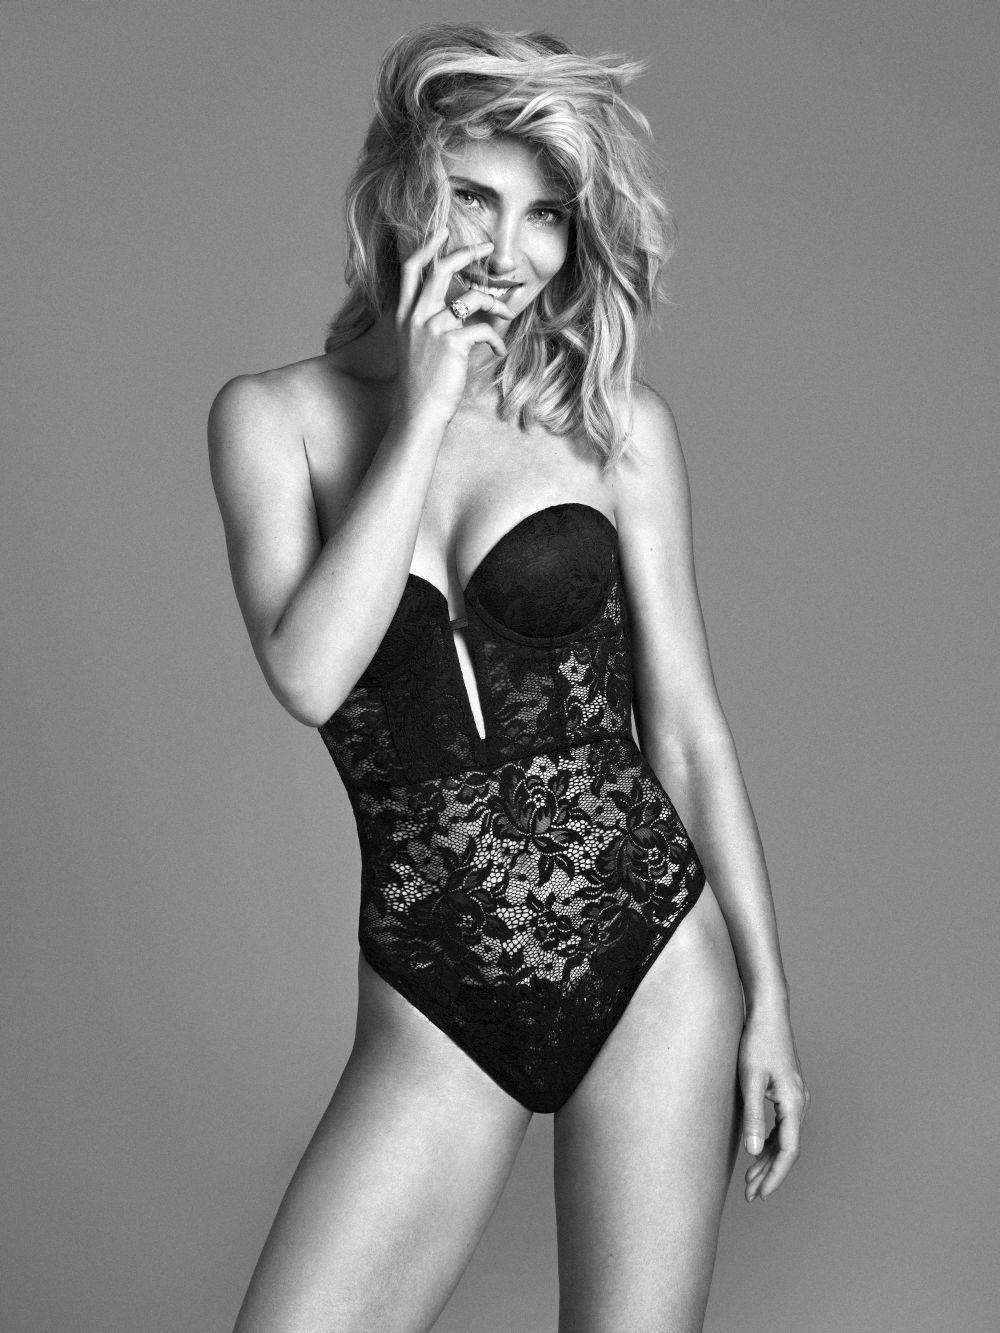 La actriz Elsa Pataky luce una espectacular forma física a sus 43...